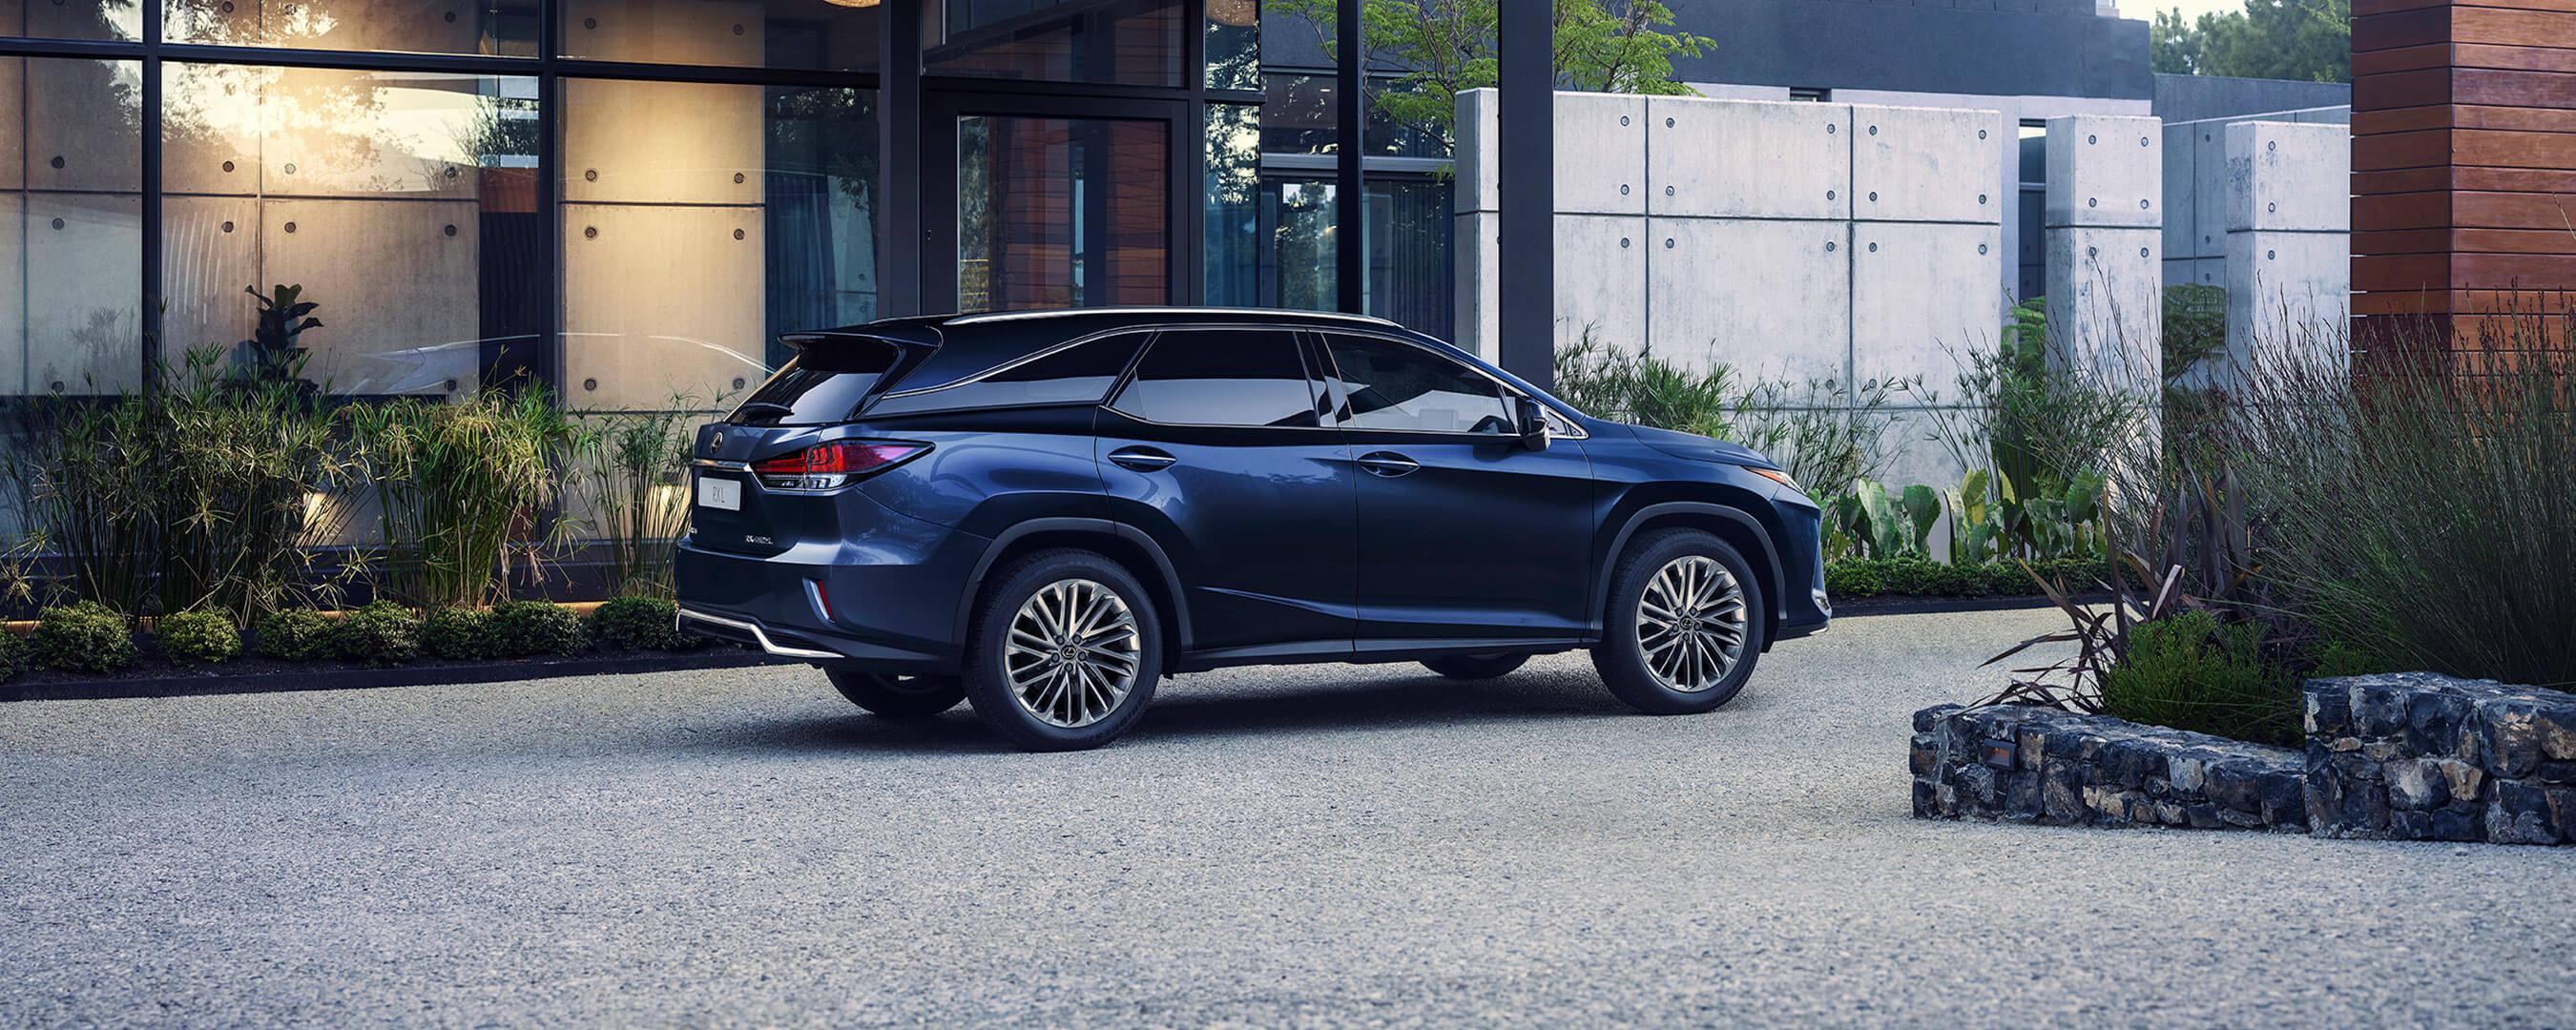 2019 lexus rxl experience rear exterior